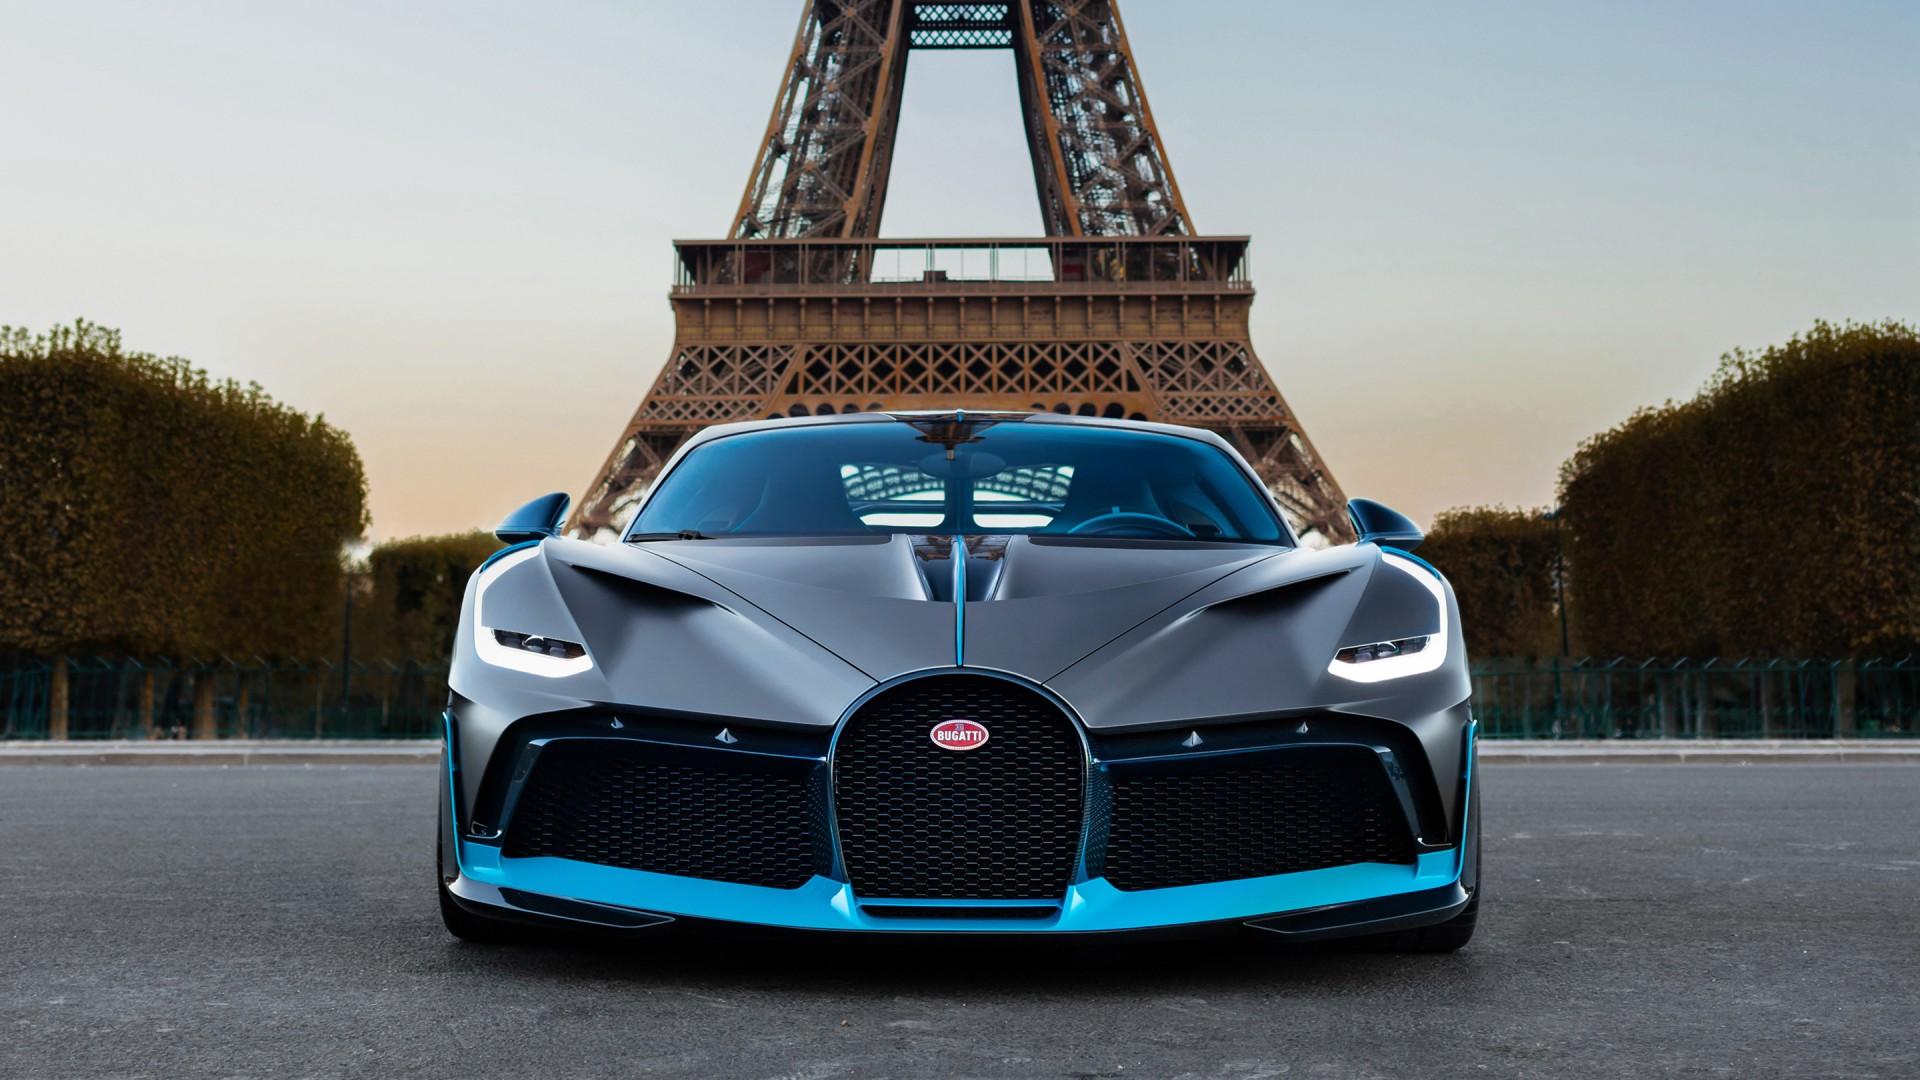 Bugatti Divo In Paris 2 Wallpaper HD Car Wallpapers ID